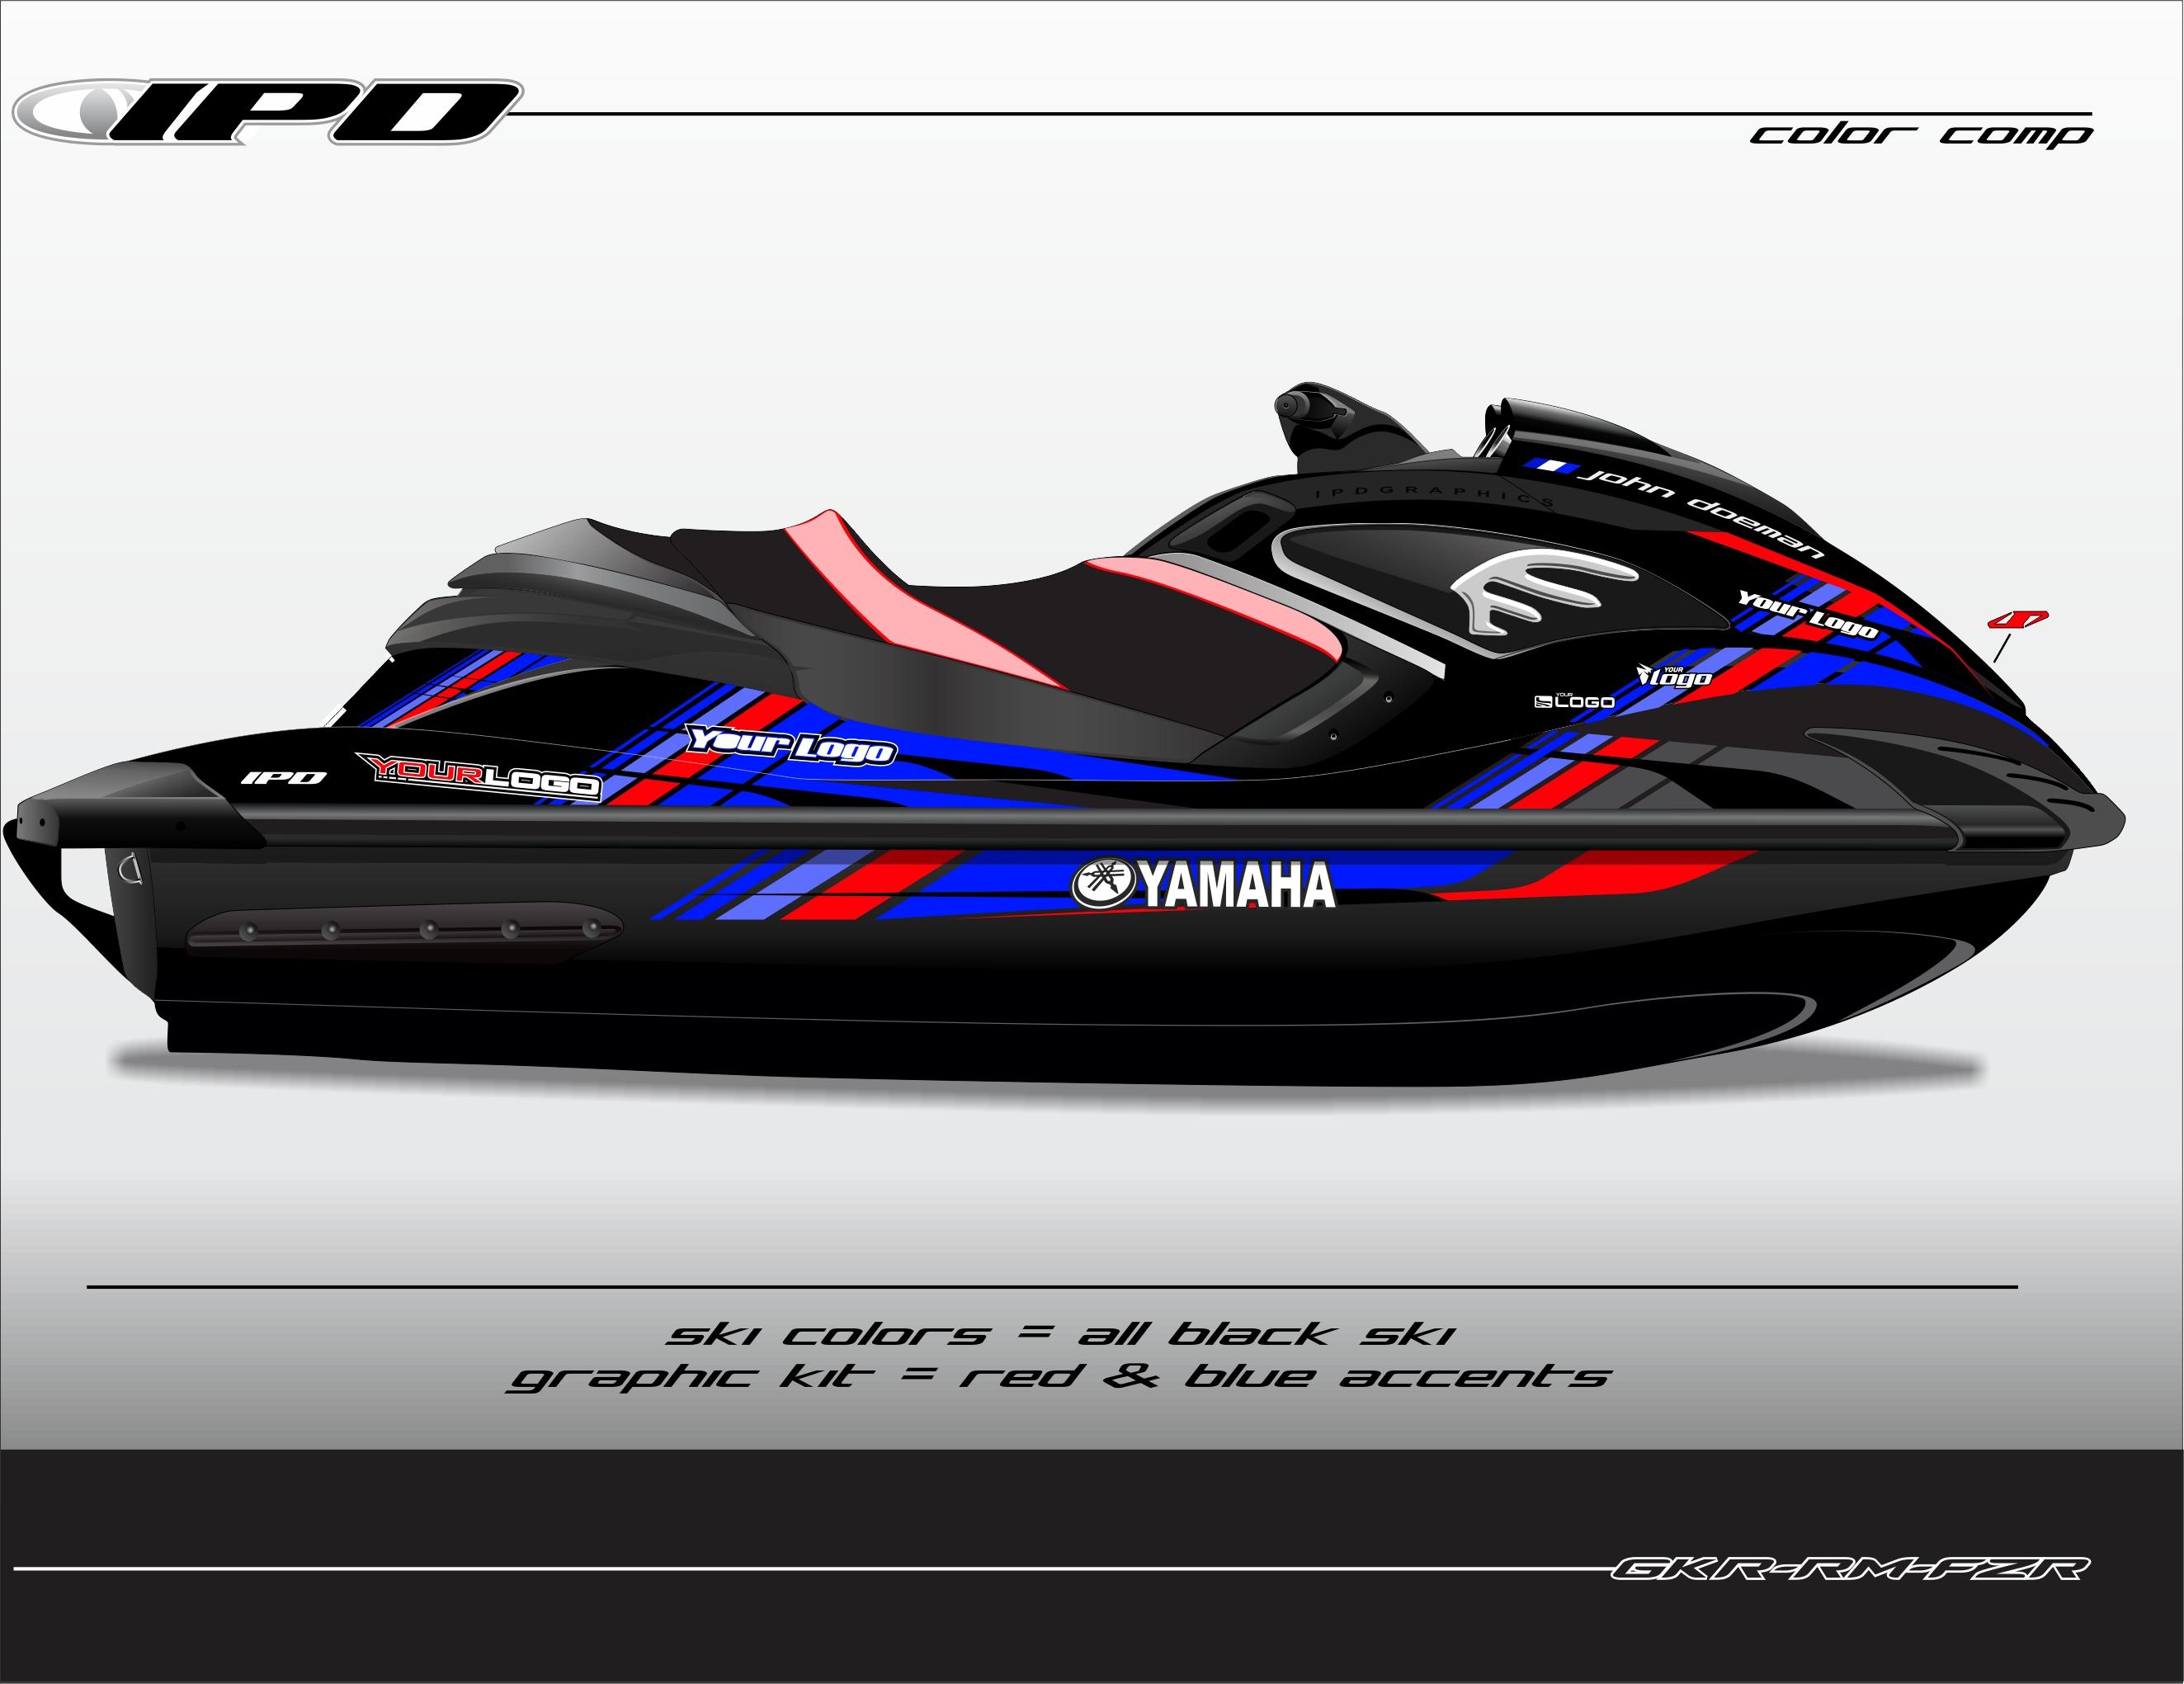 yamaha fzs fzr rec graphics kit rm design ipd jet ski graphics. Black Bedroom Furniture Sets. Home Design Ideas